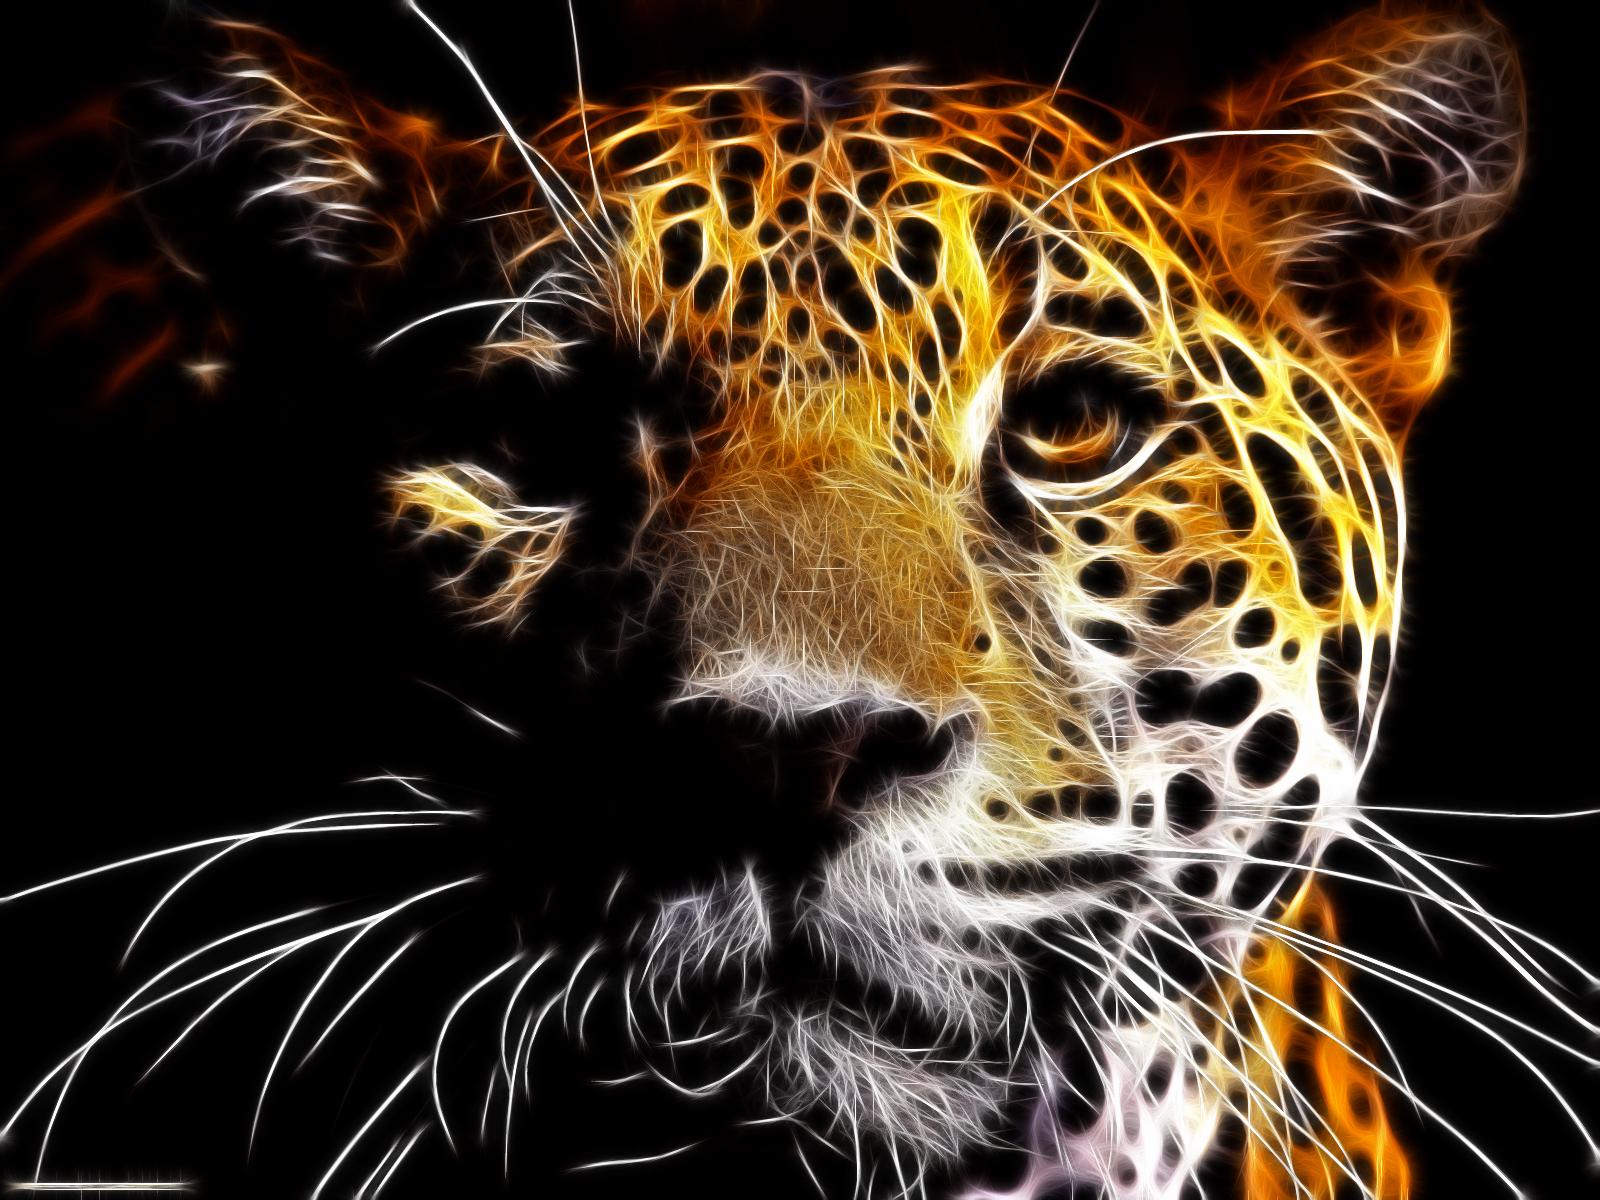 Jaguar duvar ka tlar hd jaguar wallpapers kaliteli resim - Jaguar hd pics ...